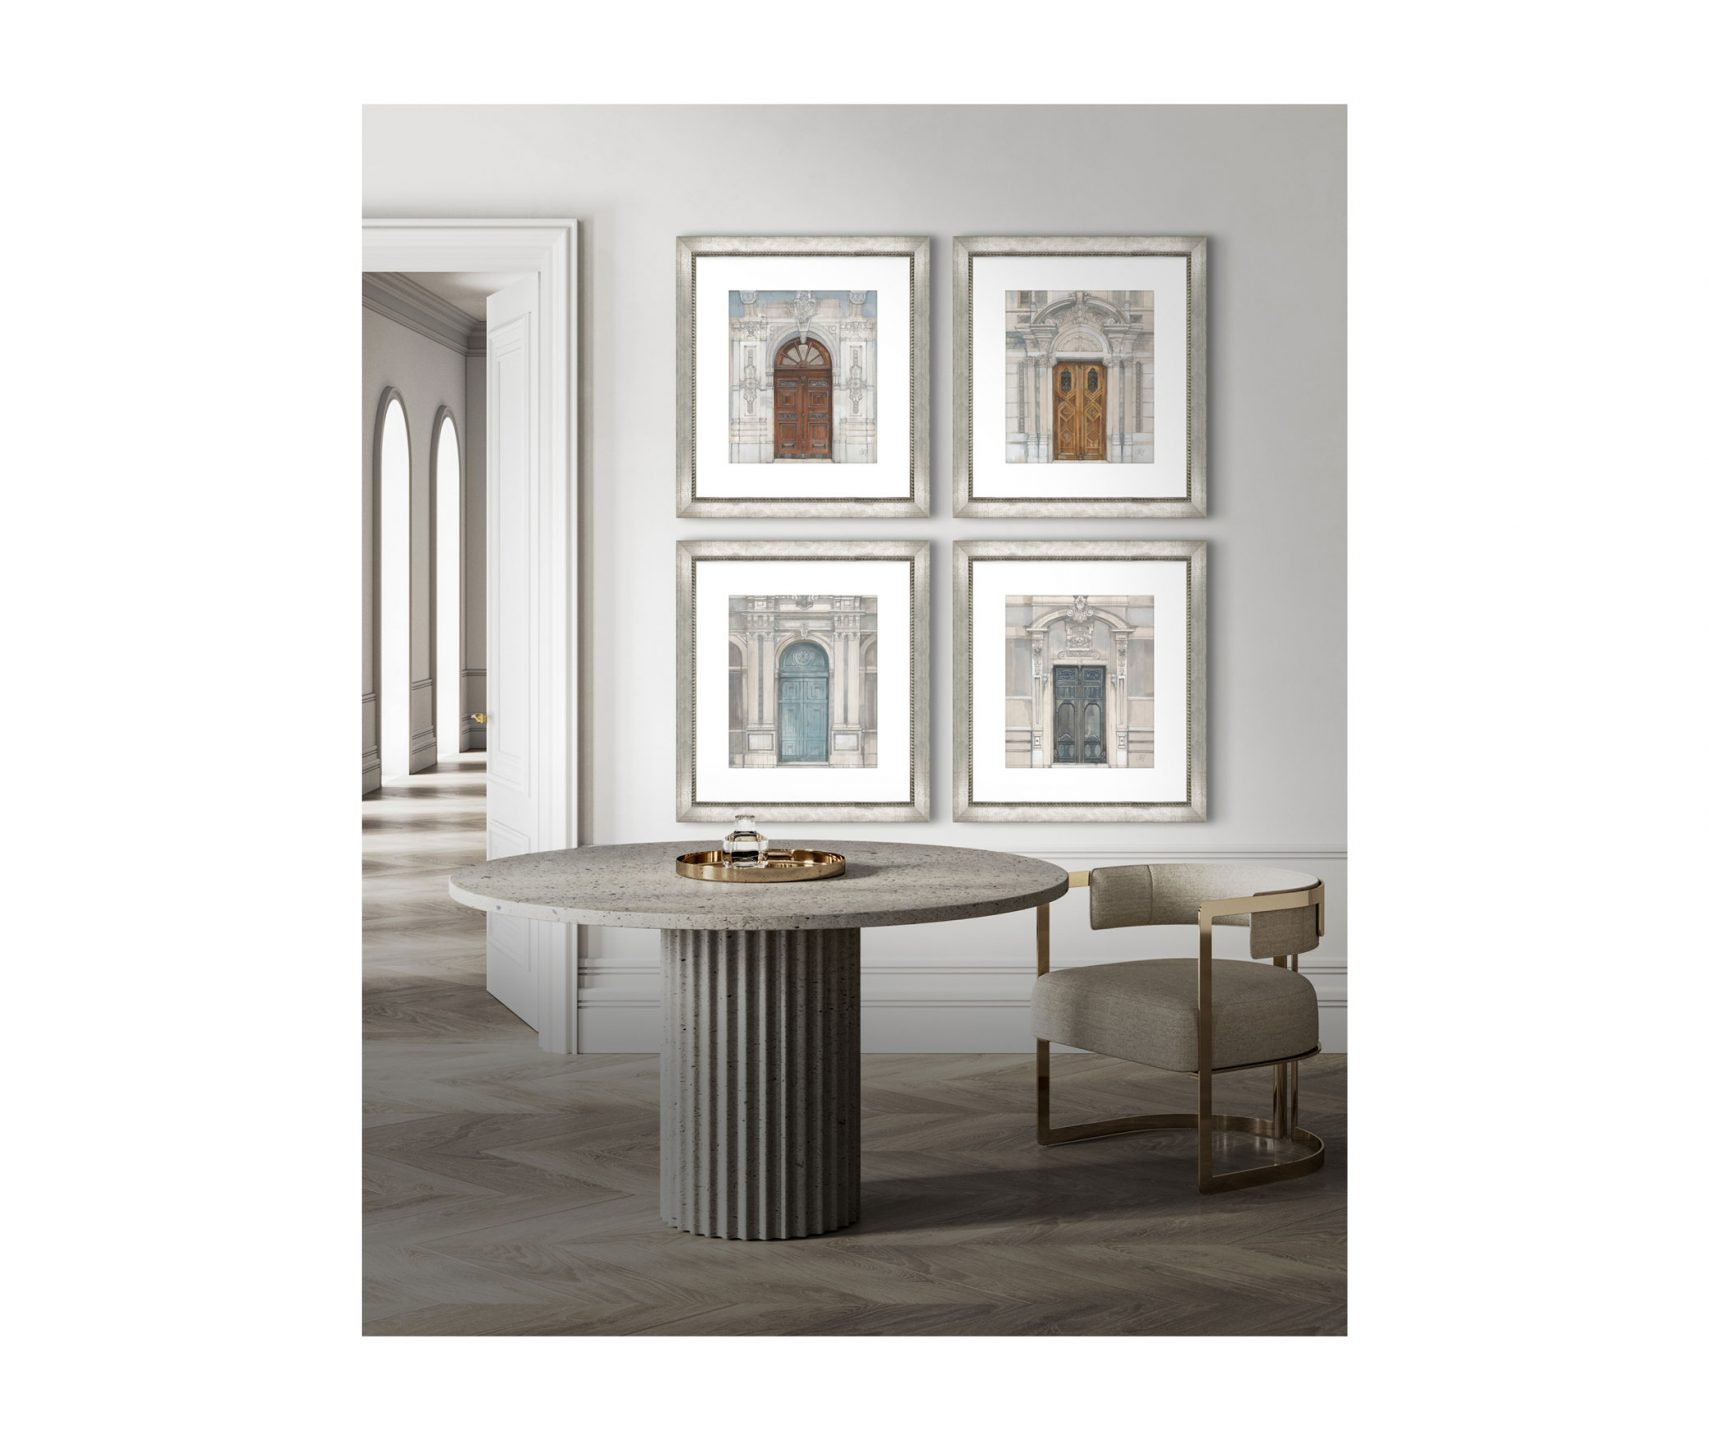 Leftbank-Art_Doors-of-Opportunity_2_int_products